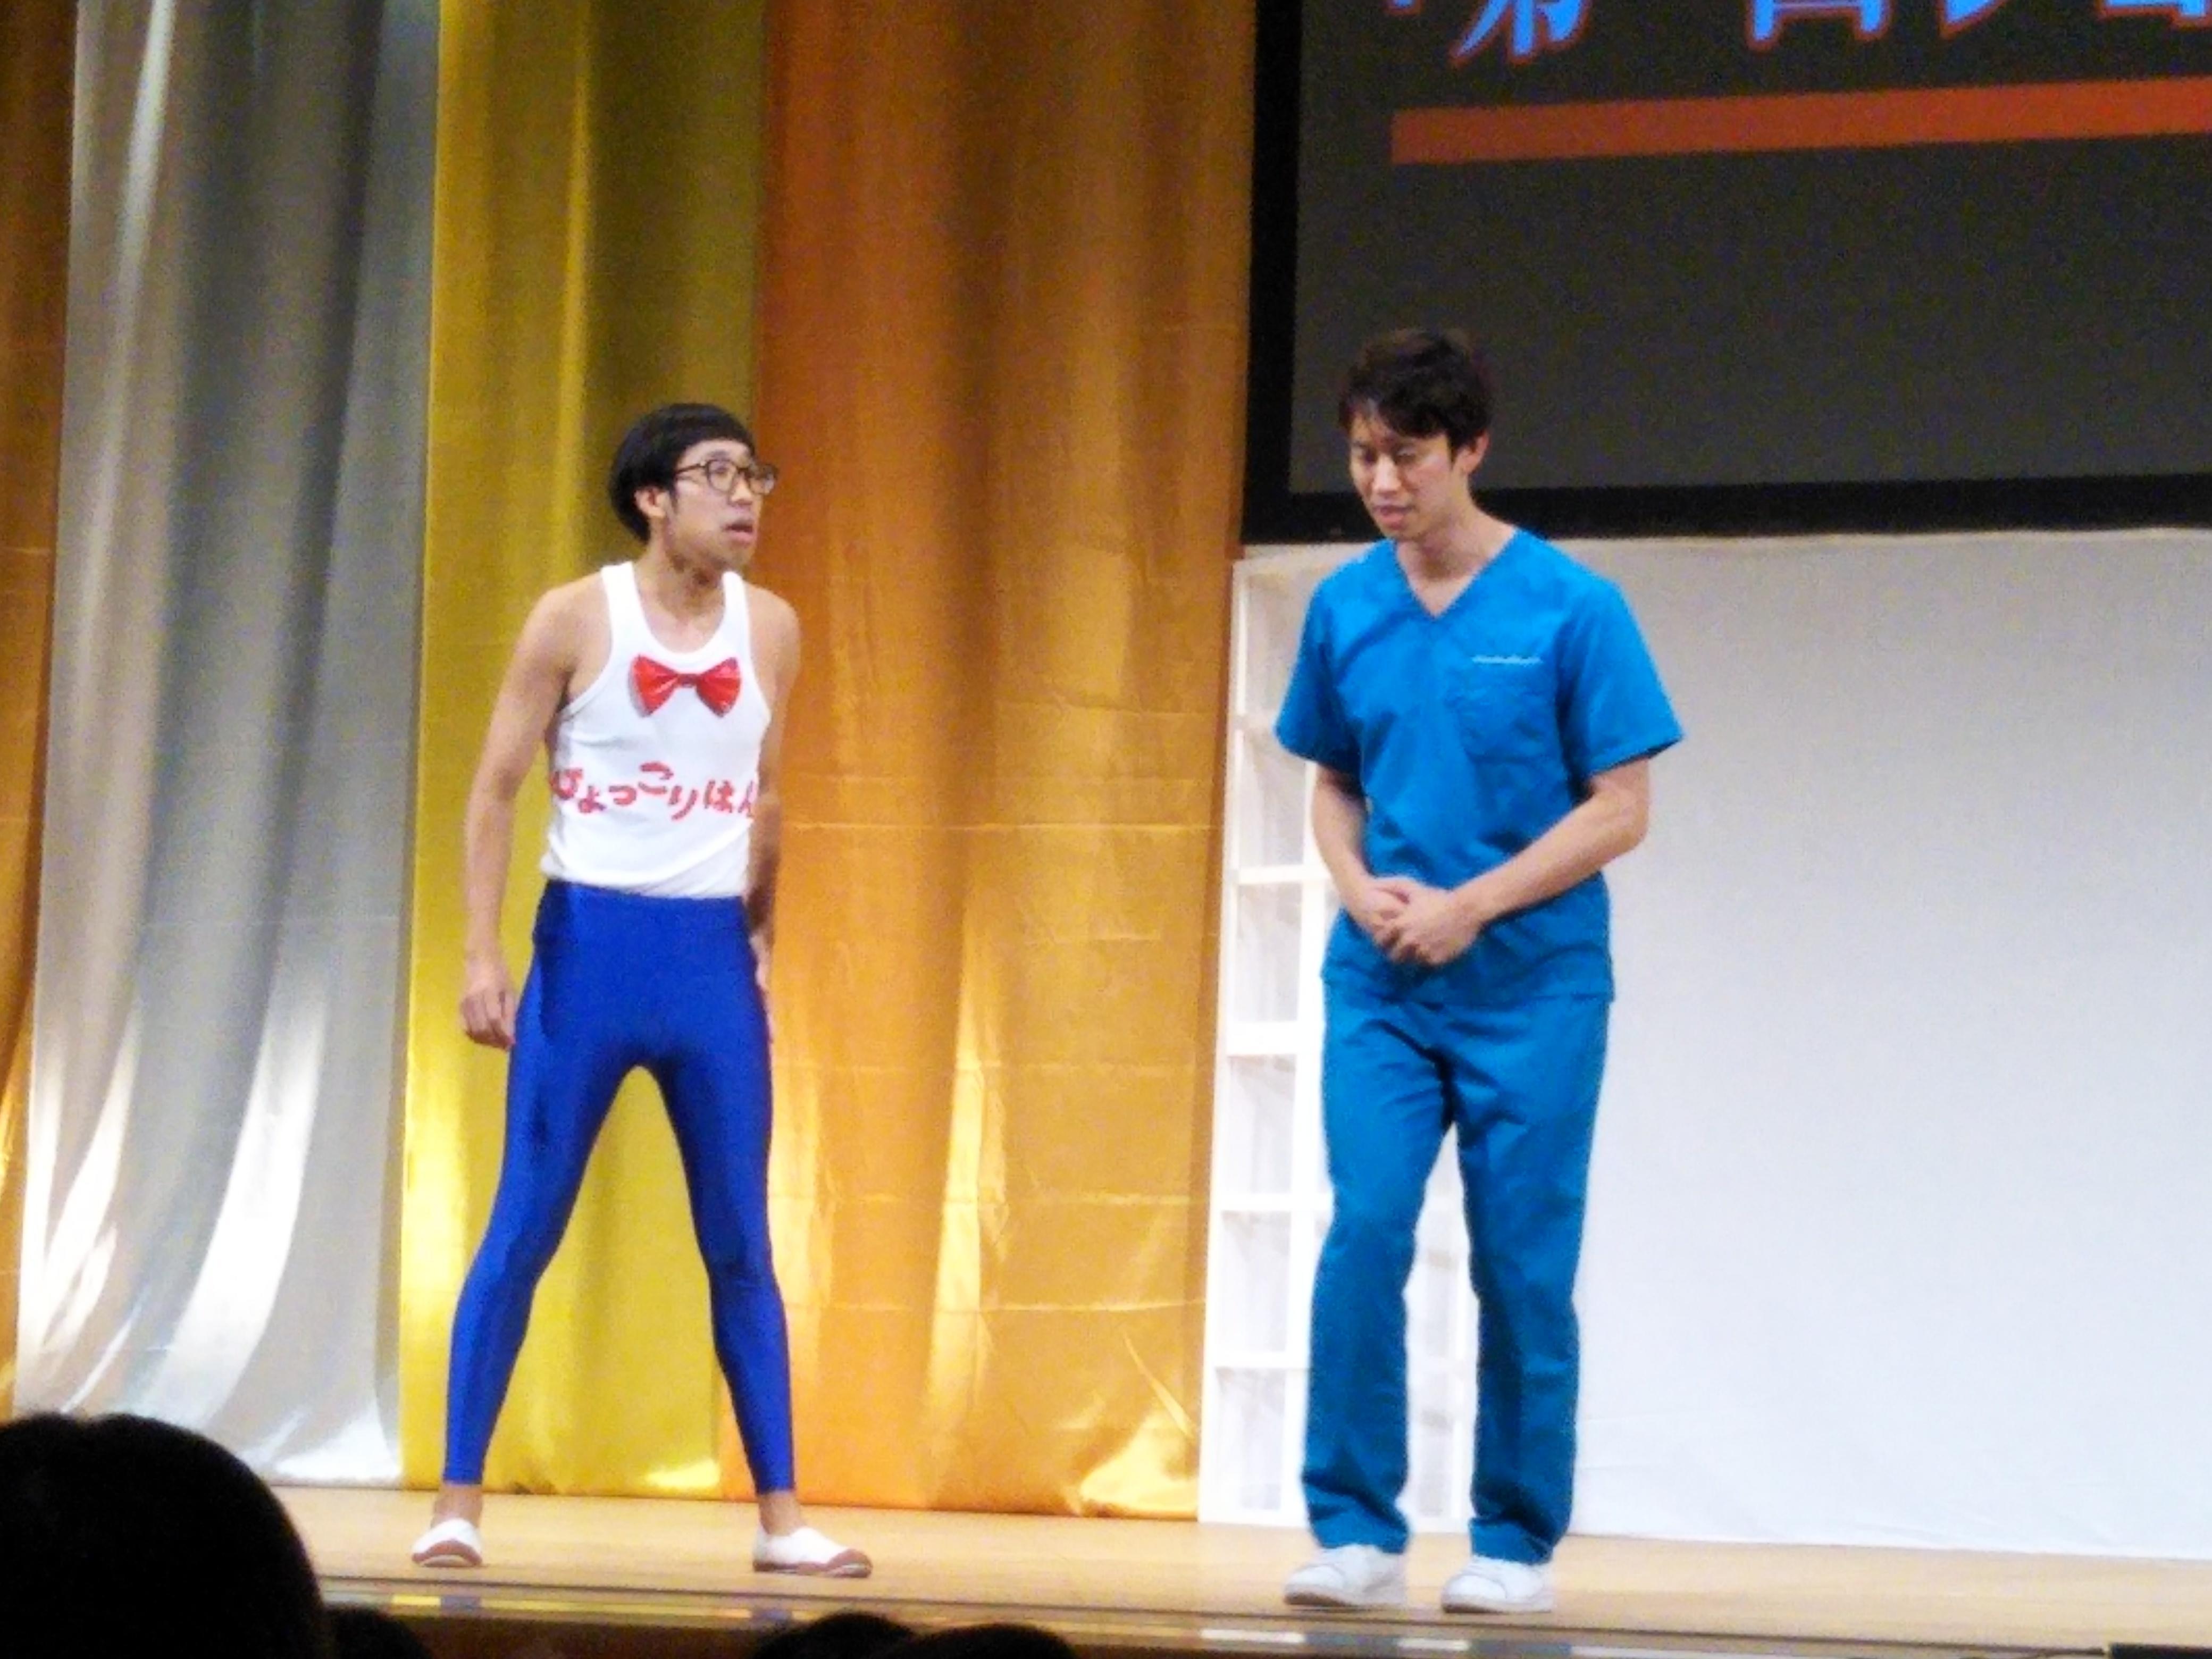 http://news.yoshimoto.co.jp/20180831104319-b01a5369ef42c9962e059b327372df2dd9d0fd6c.jpg